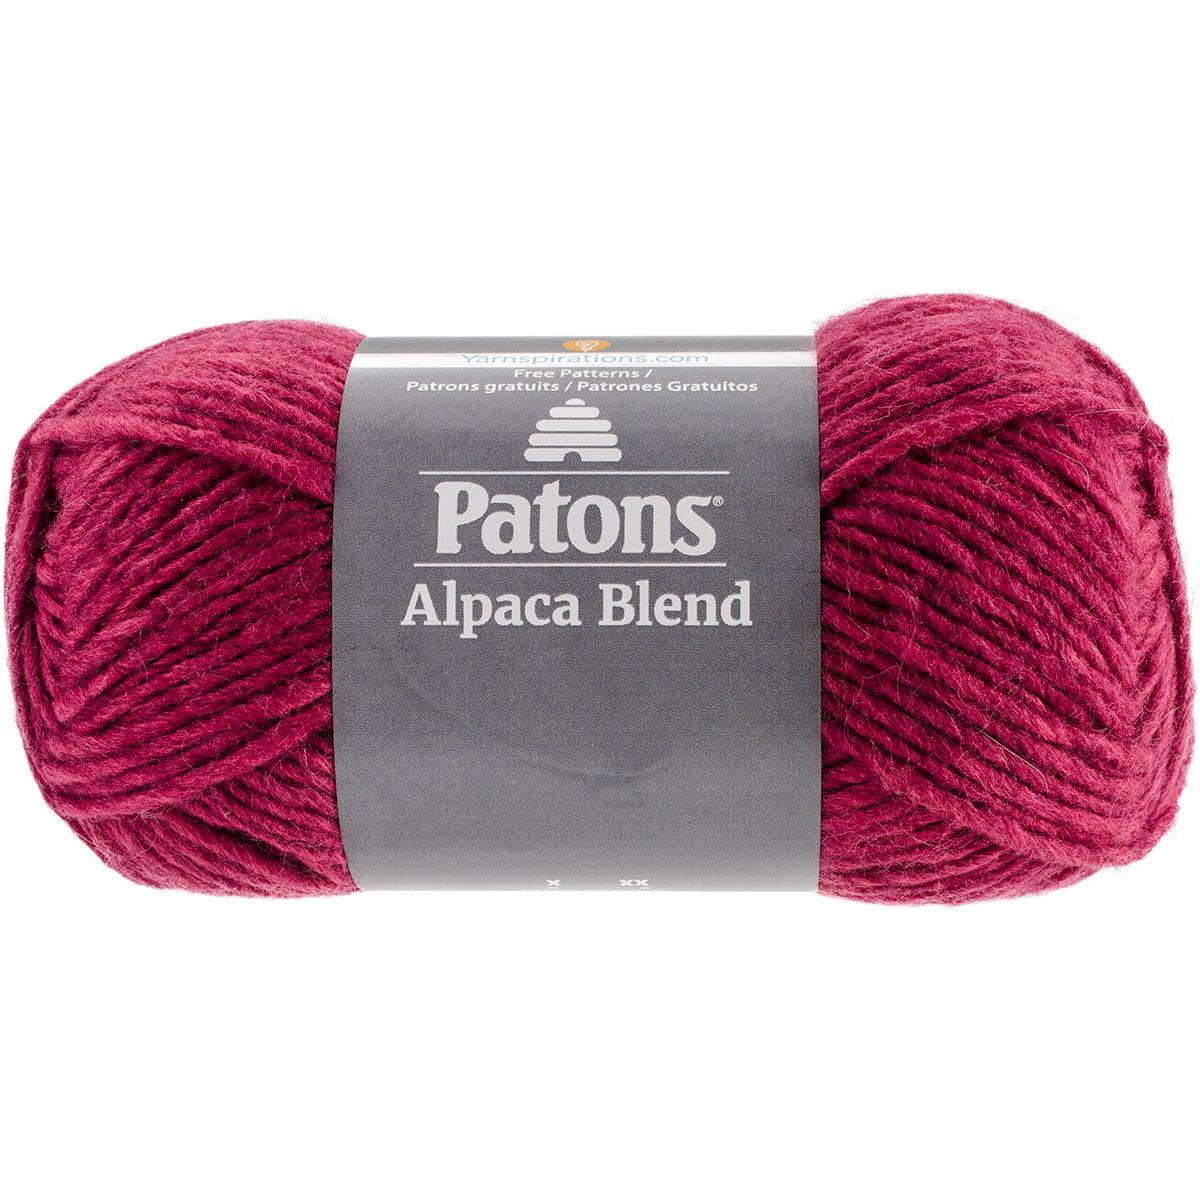 Alpaca Natural Blends Yarn-Petunia